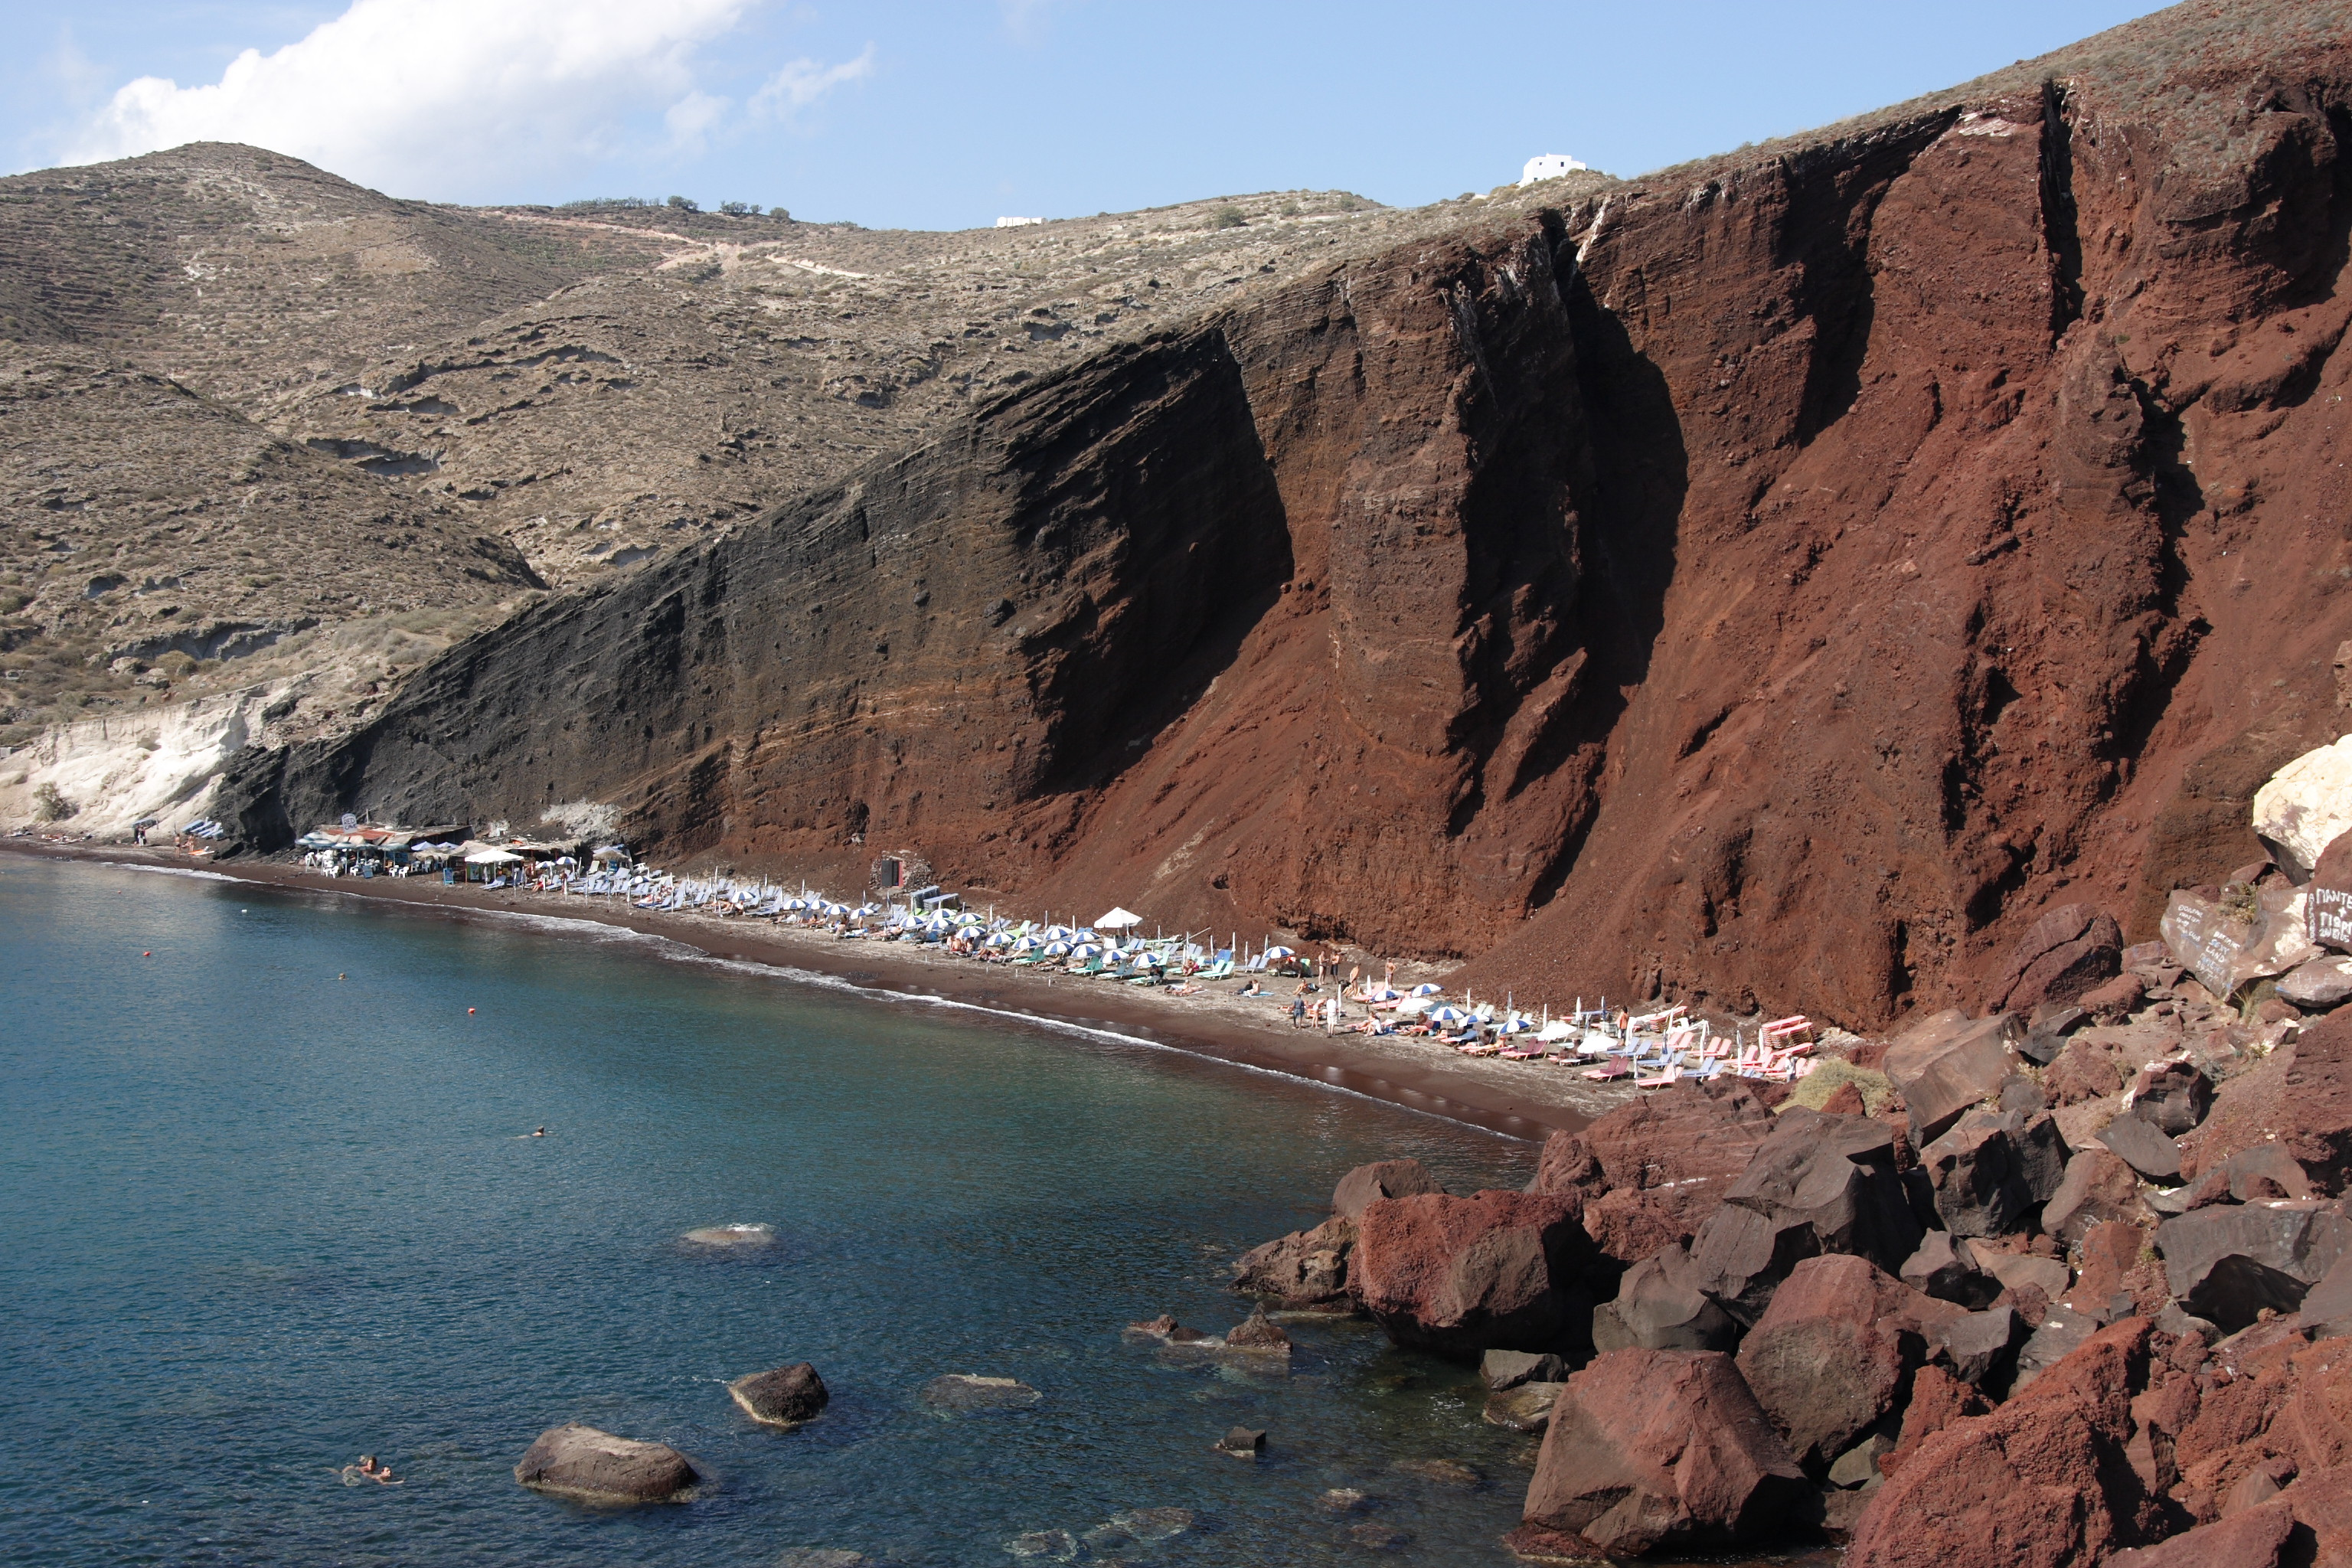 La playa roja. Fuente: Wikipedia